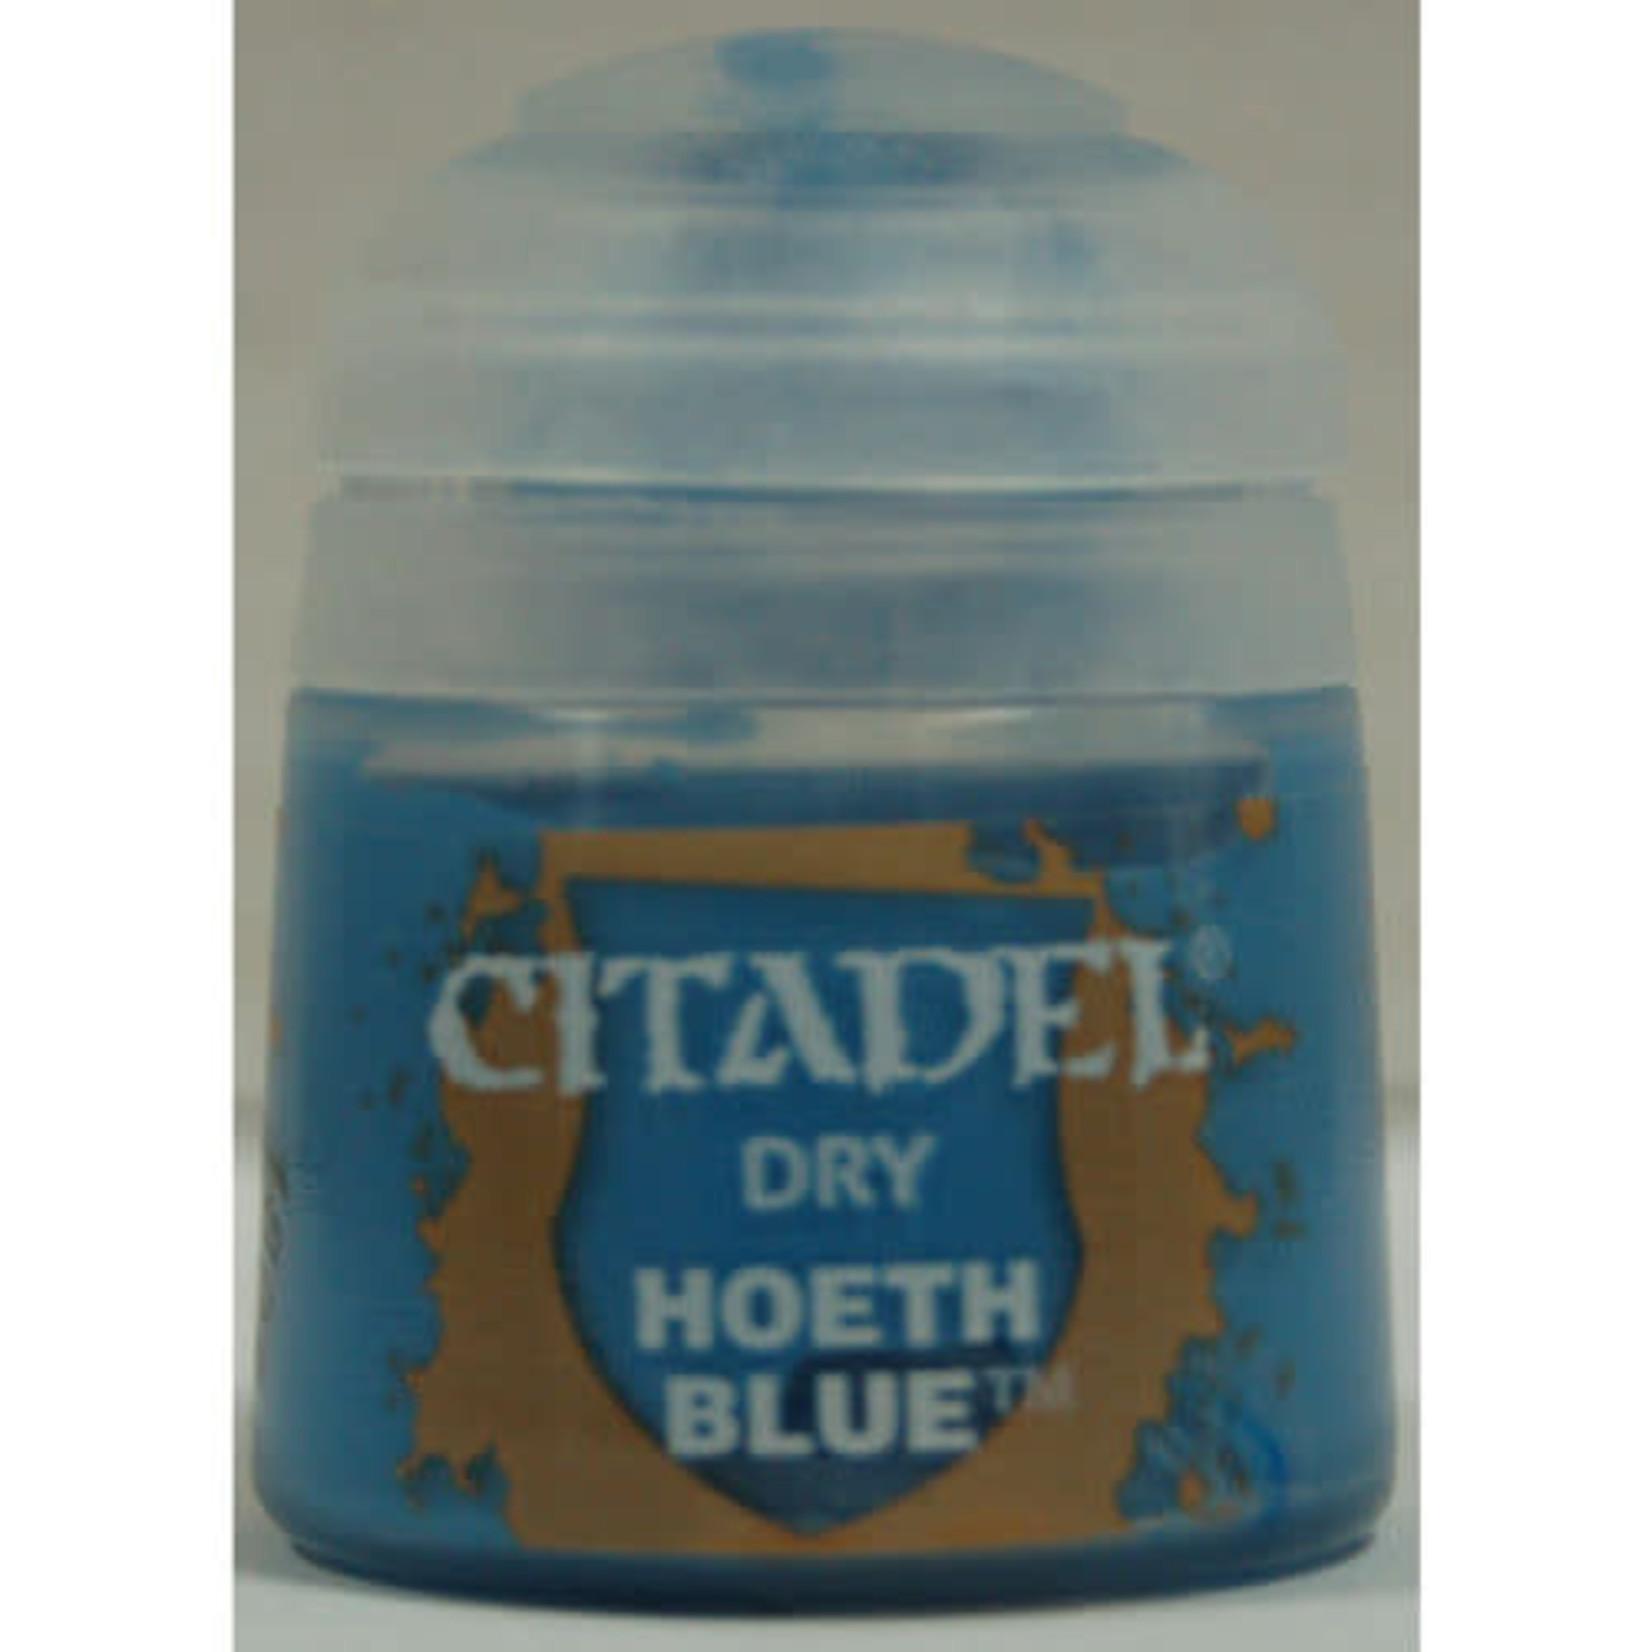 Citadel Citadel Paint - Dry: Hoeth Blue